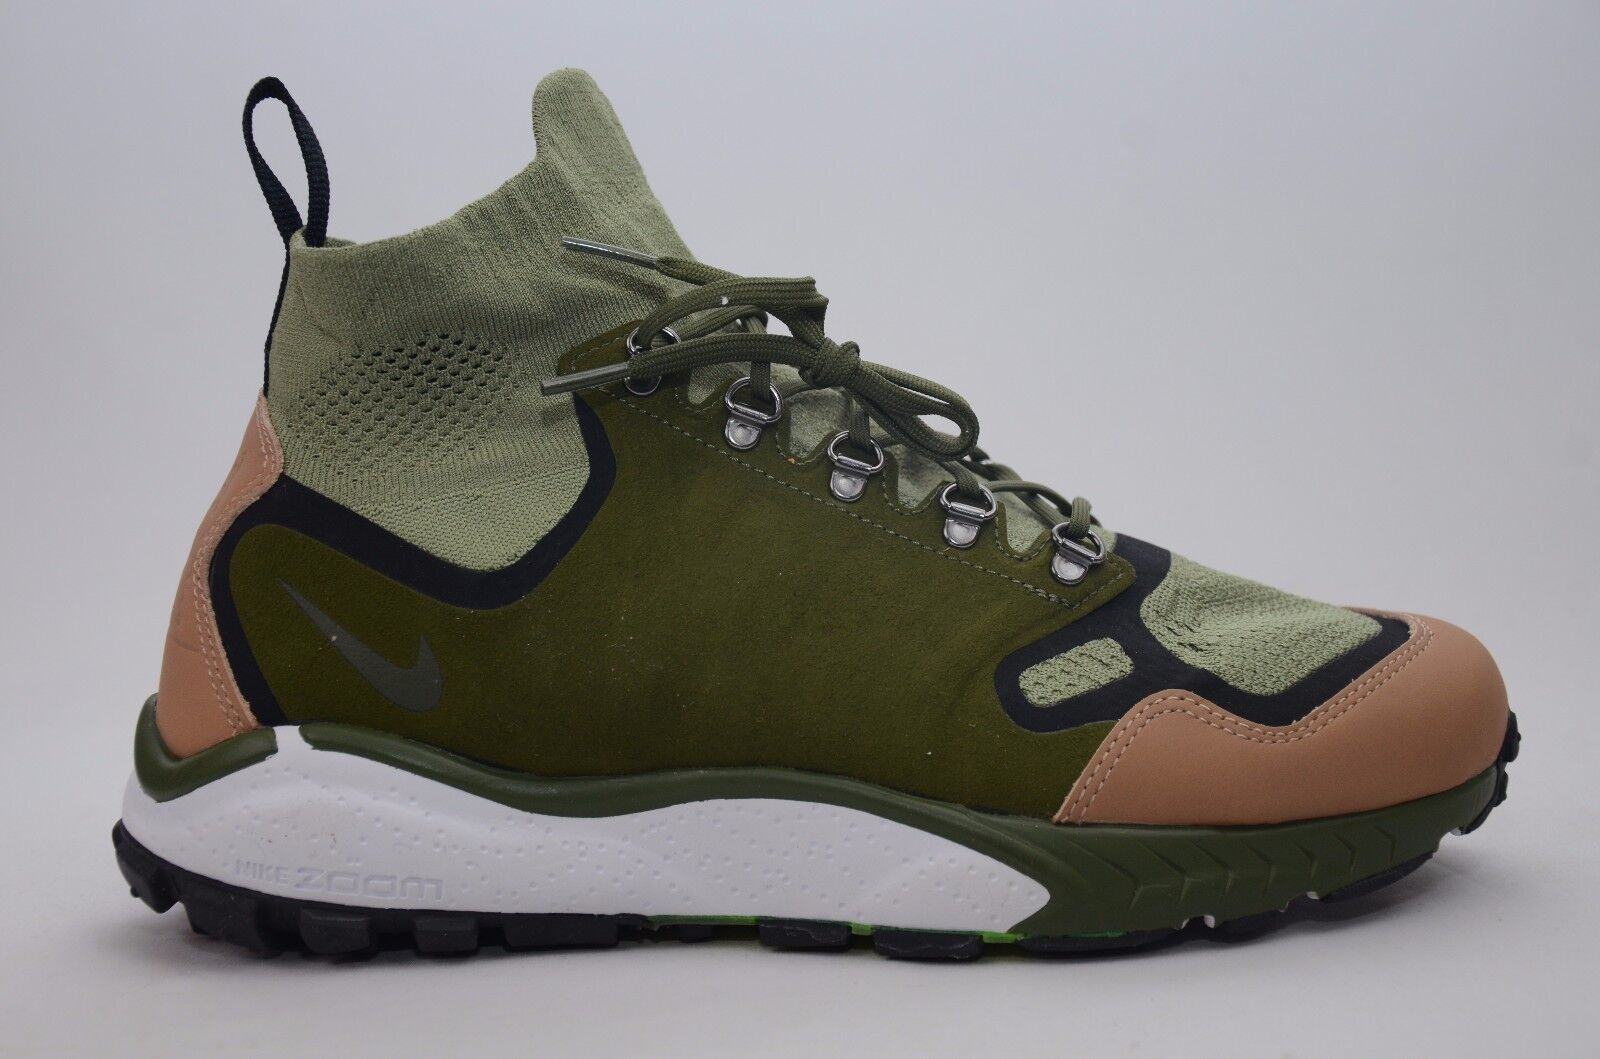 4e0df2ffdebb6 Nike Air Zoom Talaria Mid Flyknit PRM 875784-300 Mens Sz 8 Shoes for ...